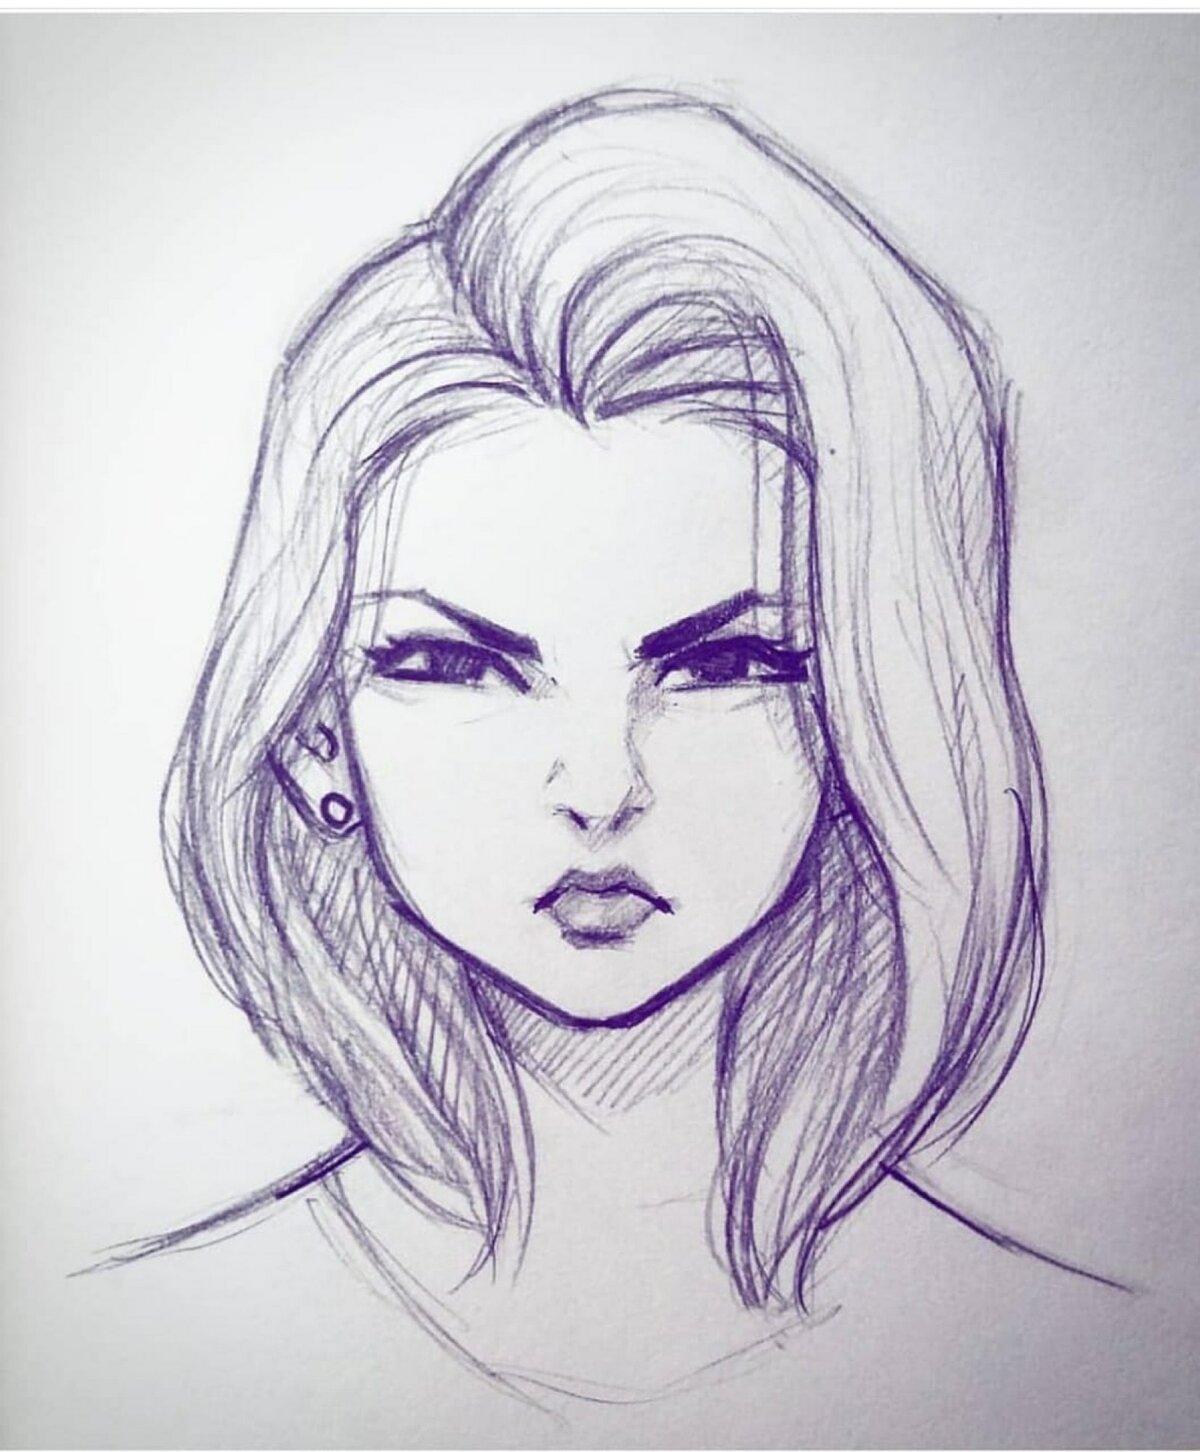 Картинки карандашом для срисовки человечки